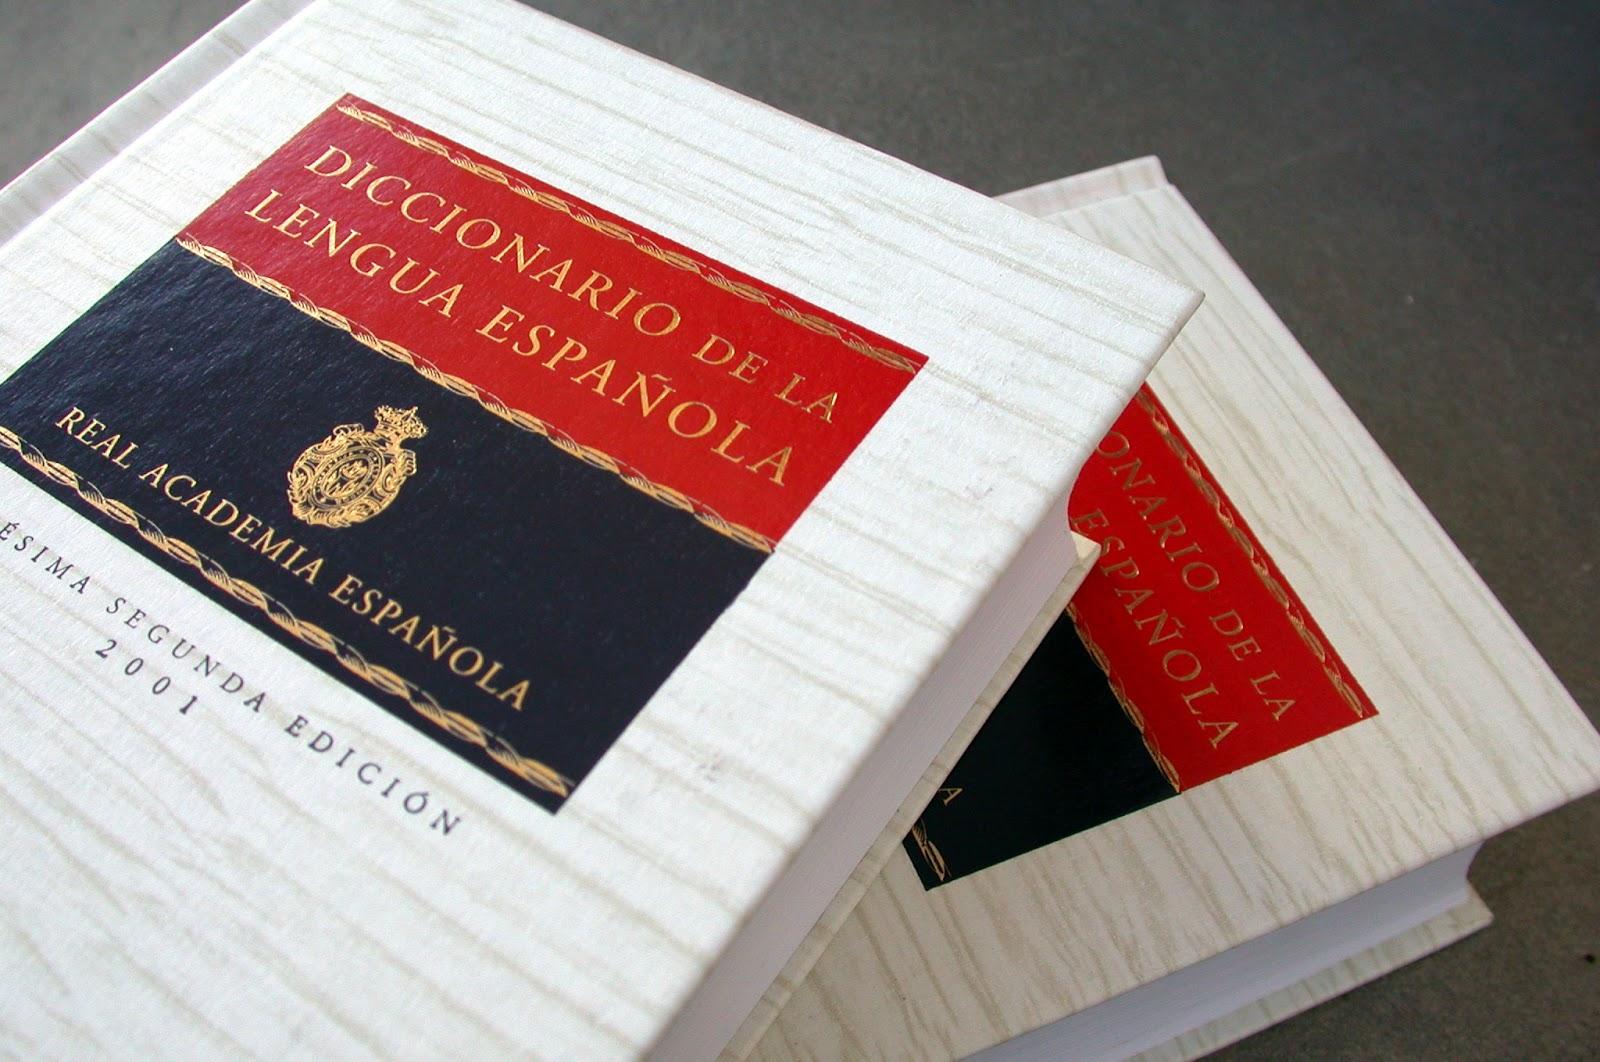 Diccionario de la RAE imagen tomada de http://www.clasesdeperiodismo.com/wp-content/uploads/2017/06/diccionario-rae.jpg